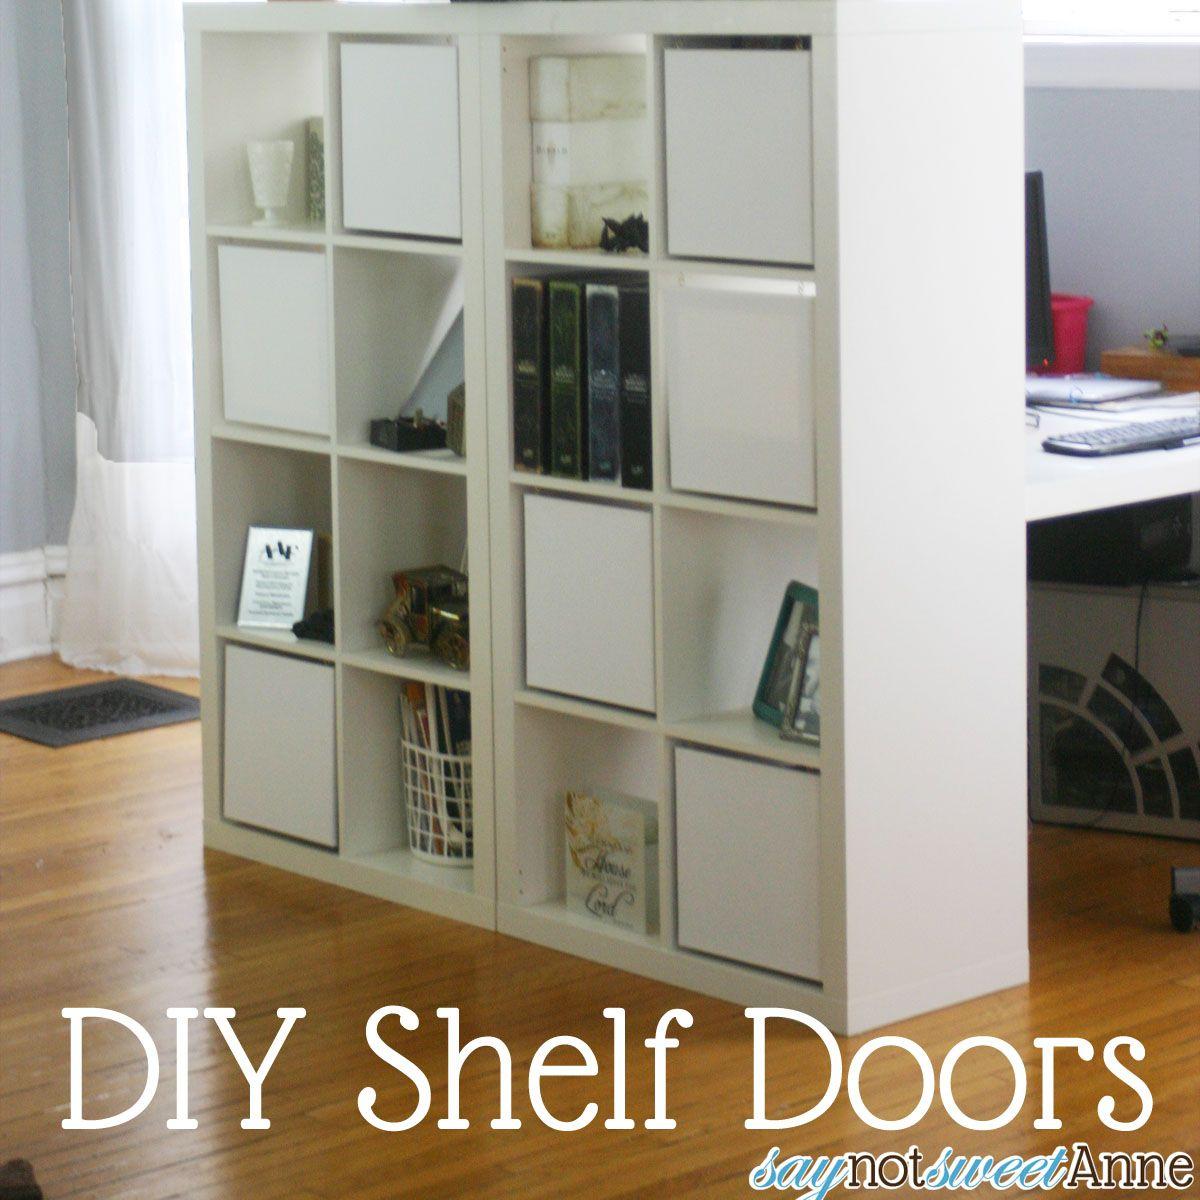 Ikea Expedite 10 Shelf Doors Sweet Anne Designs Diy Shelves Ikea Bookcase Shelves